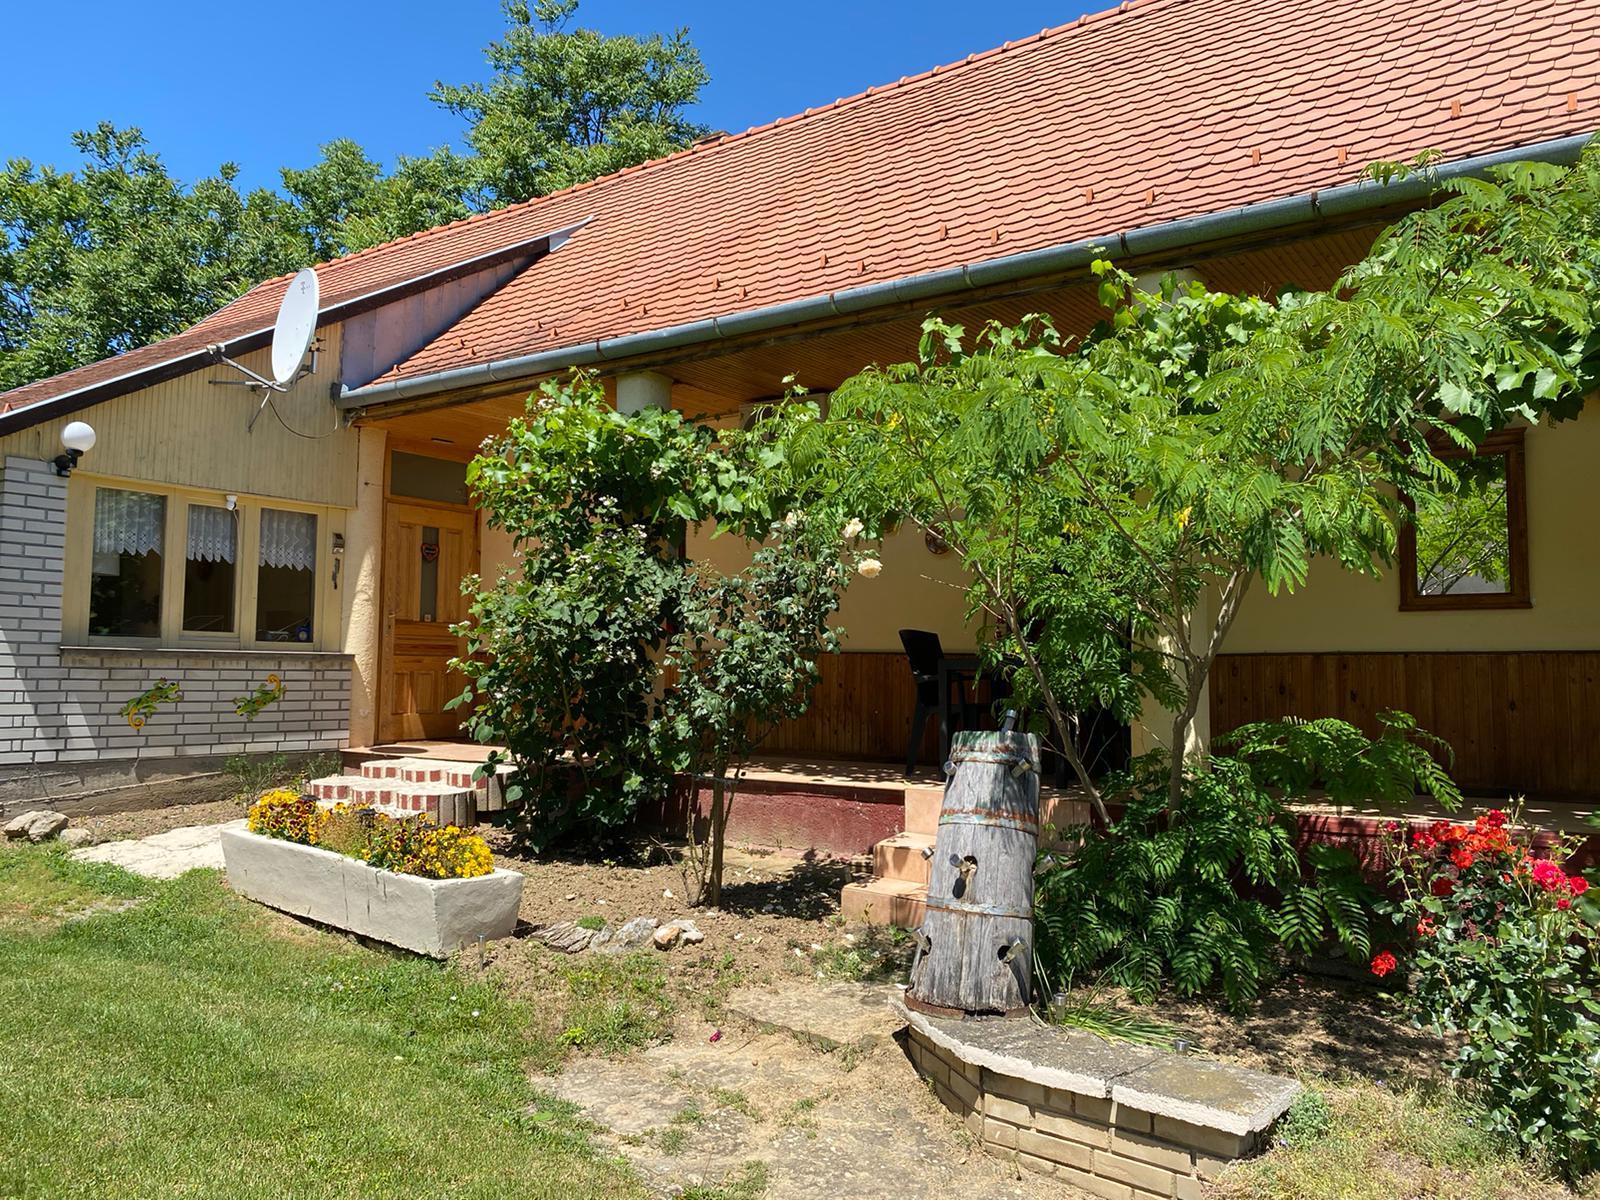 het hongaarse huisje 14 Vakantie Woning Hongarije